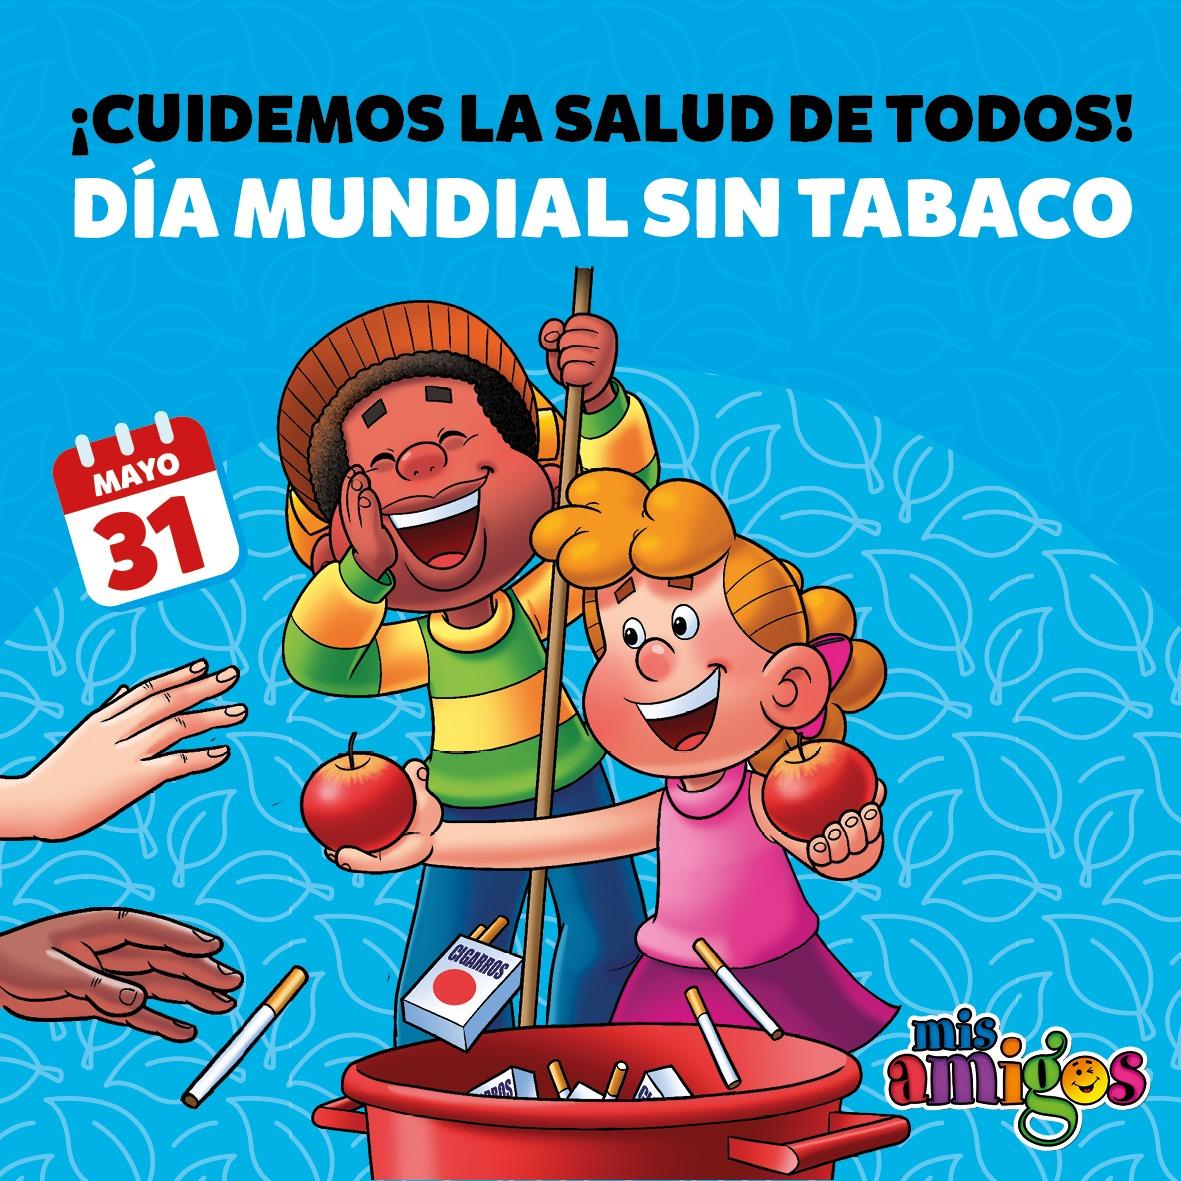 D a mundial sin tabaco for Cuarto dia sin fumar